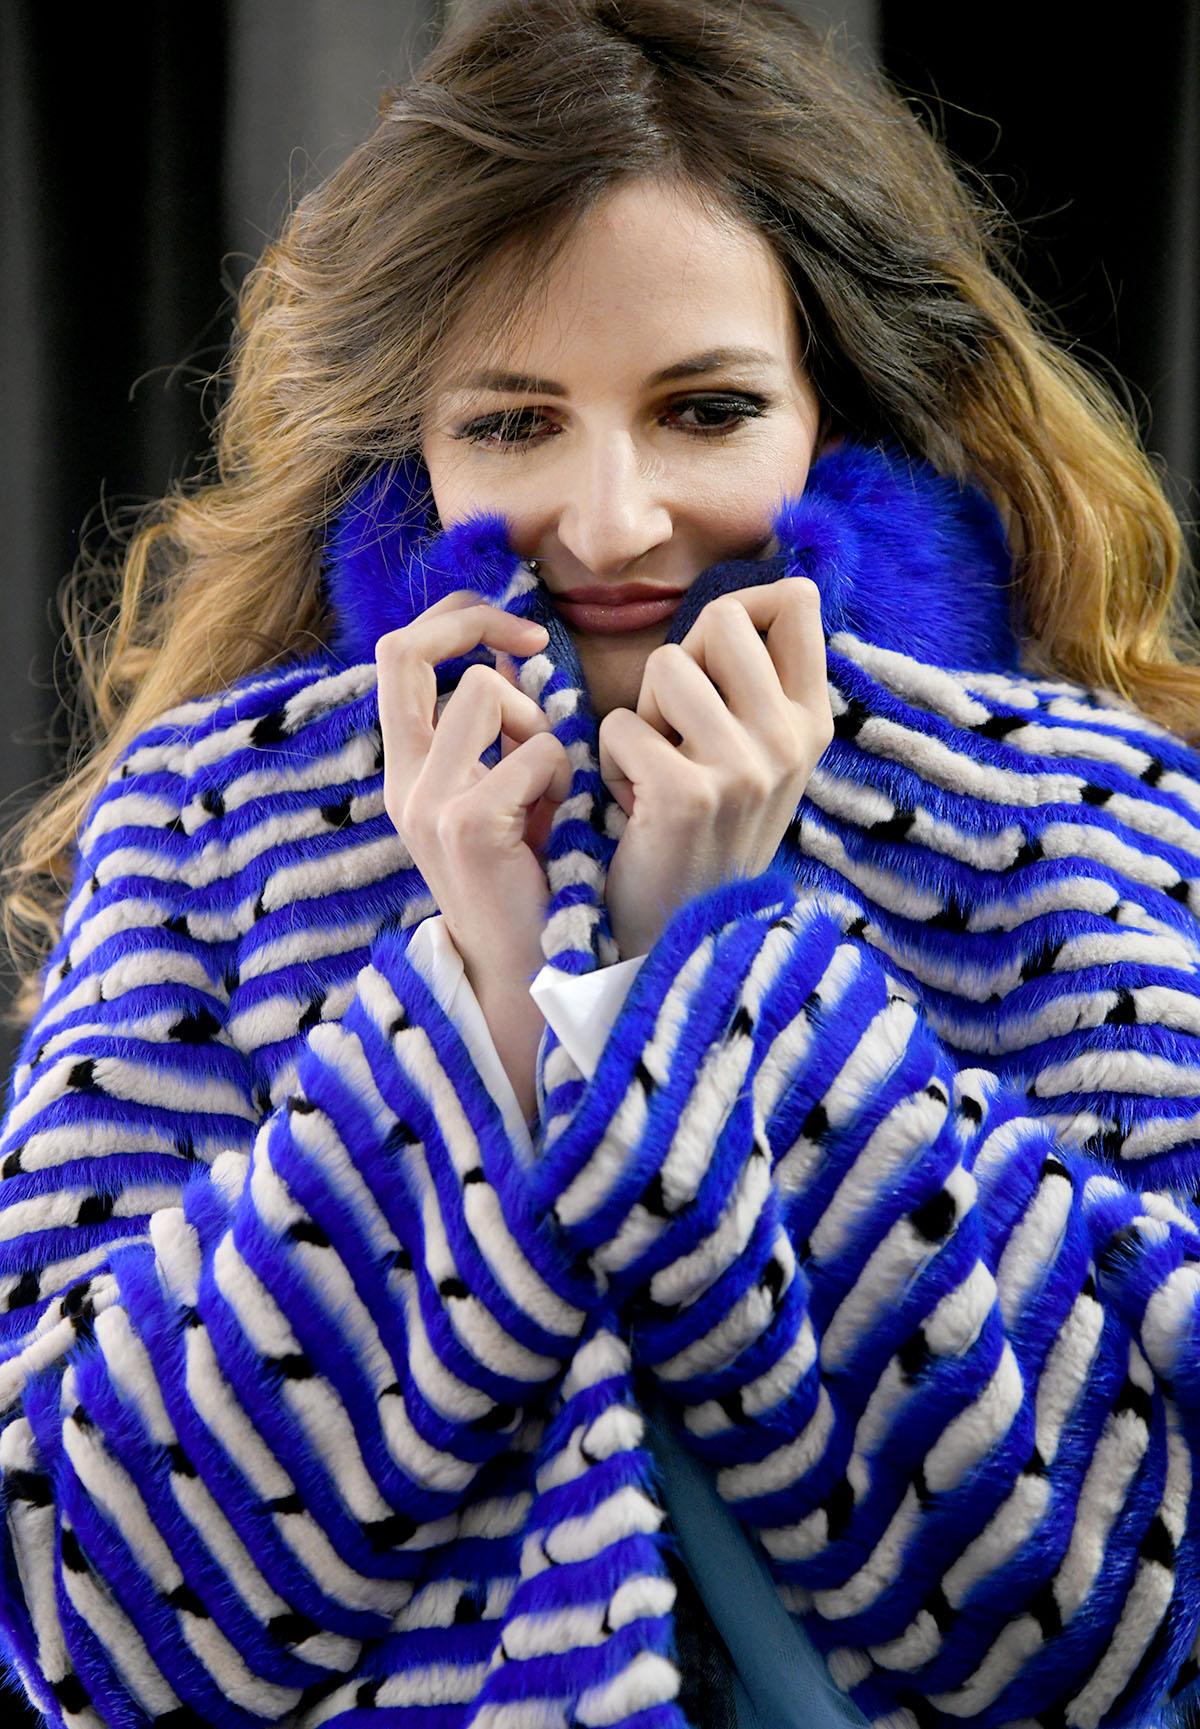 Extravagant makeover by Vividenti Kalmar: Ivana Mrak